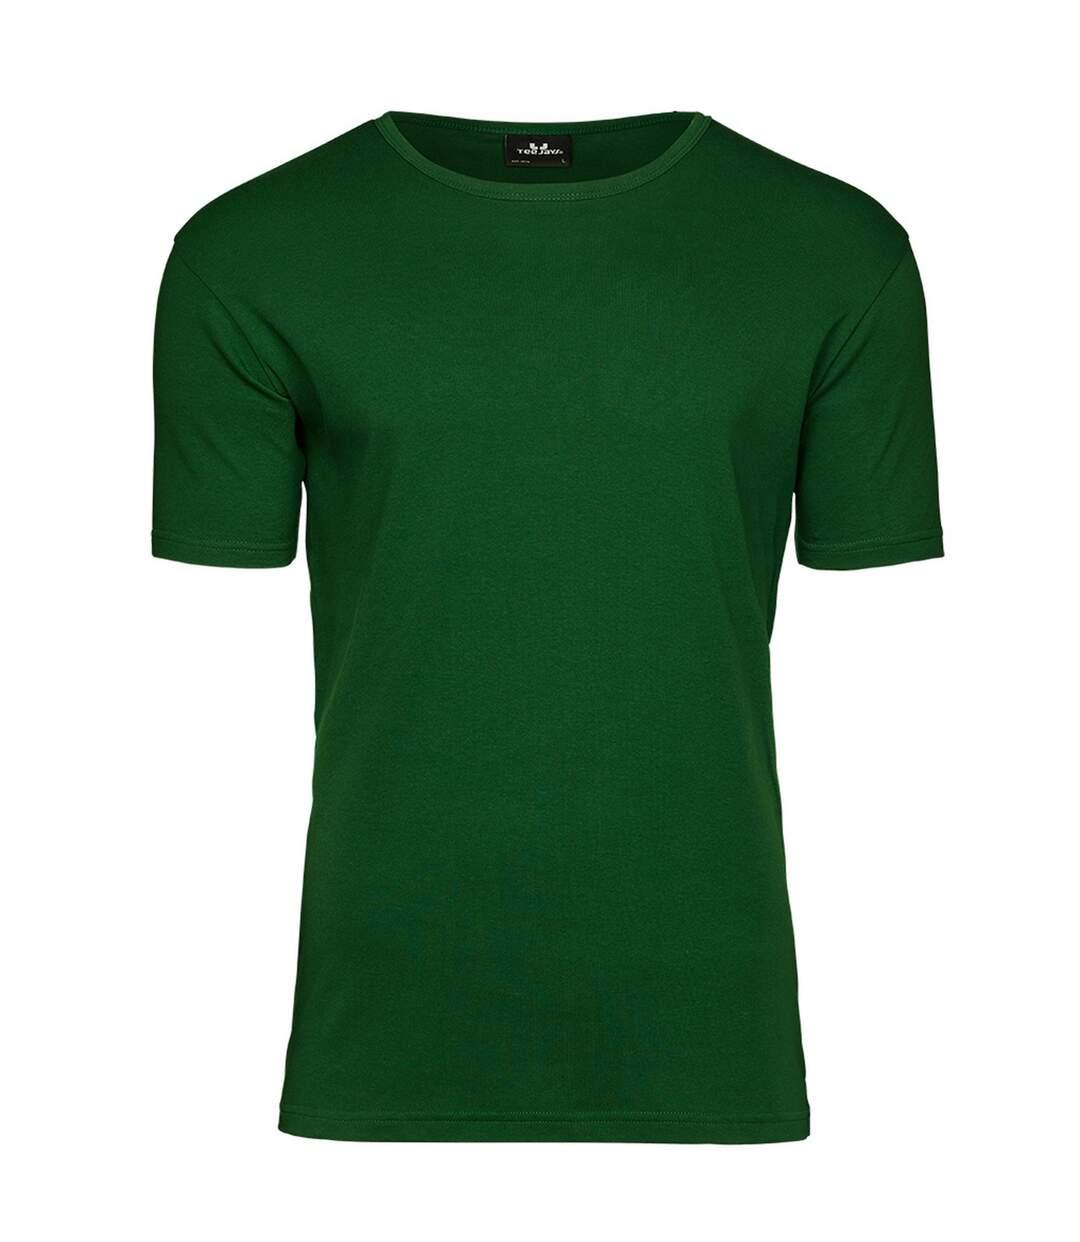 Tee Jays Mens Interlock T-Shirt (Forest Green) - UTPC4094